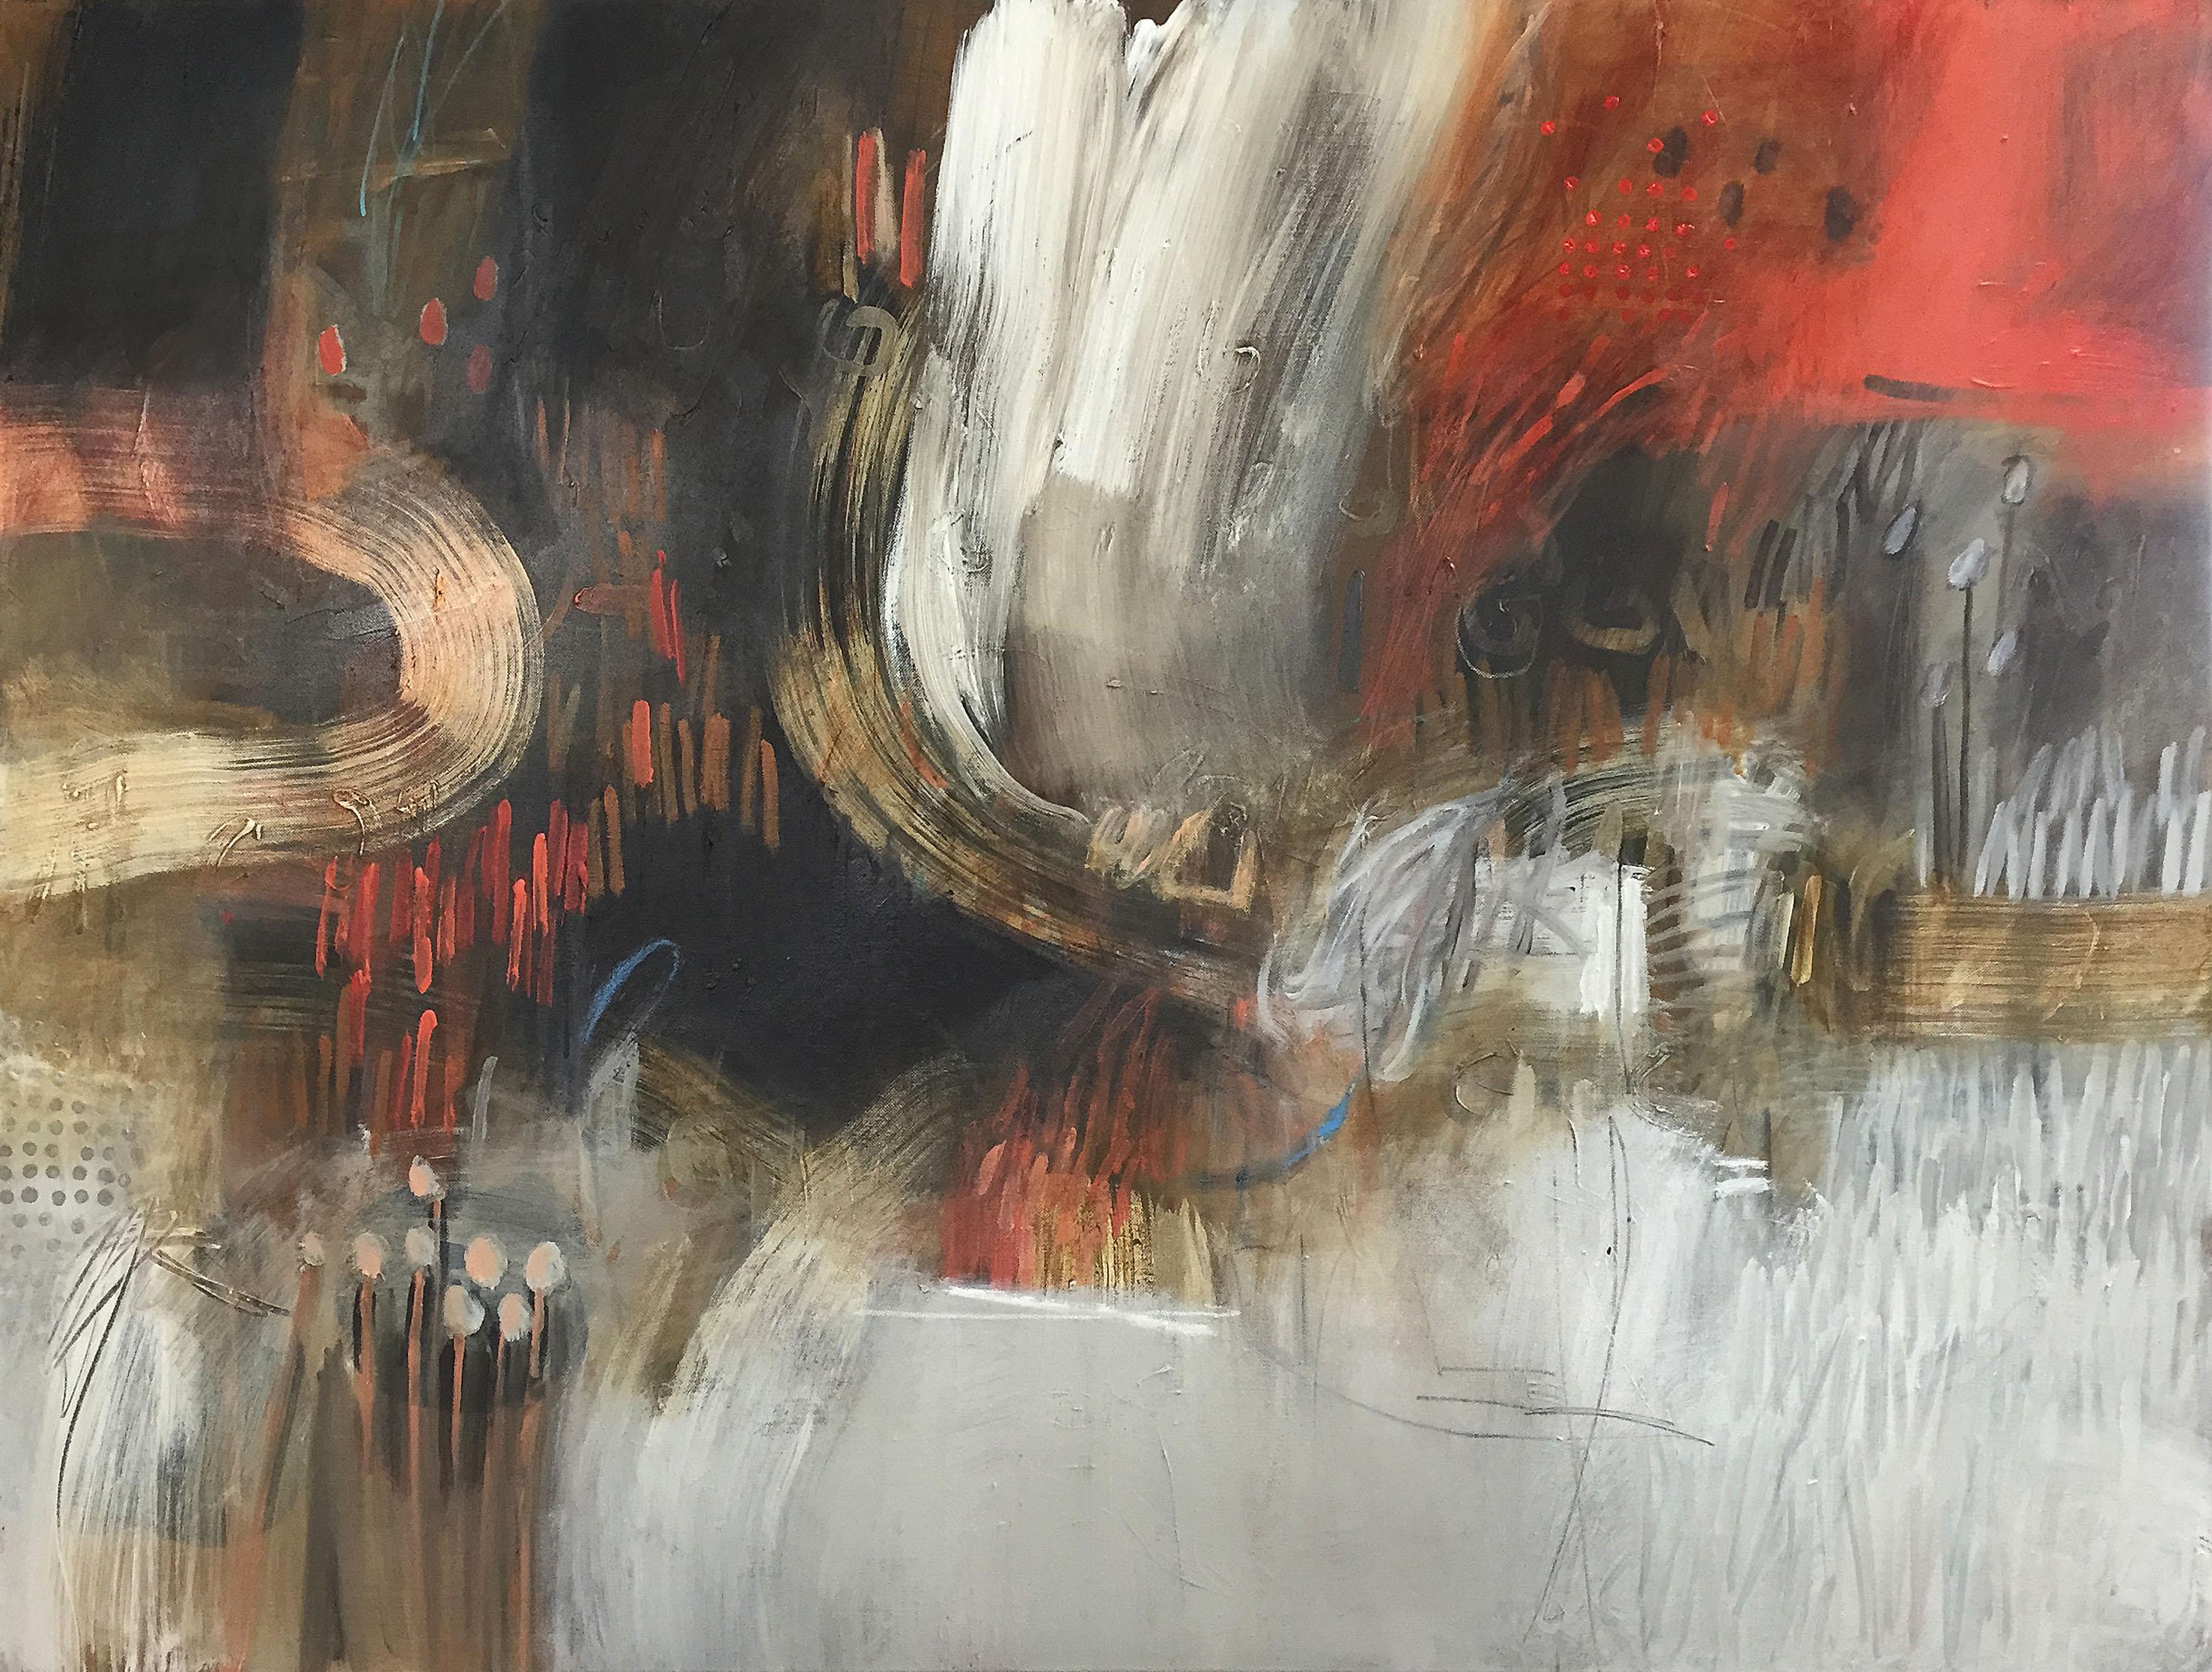 Untitled 16-2151